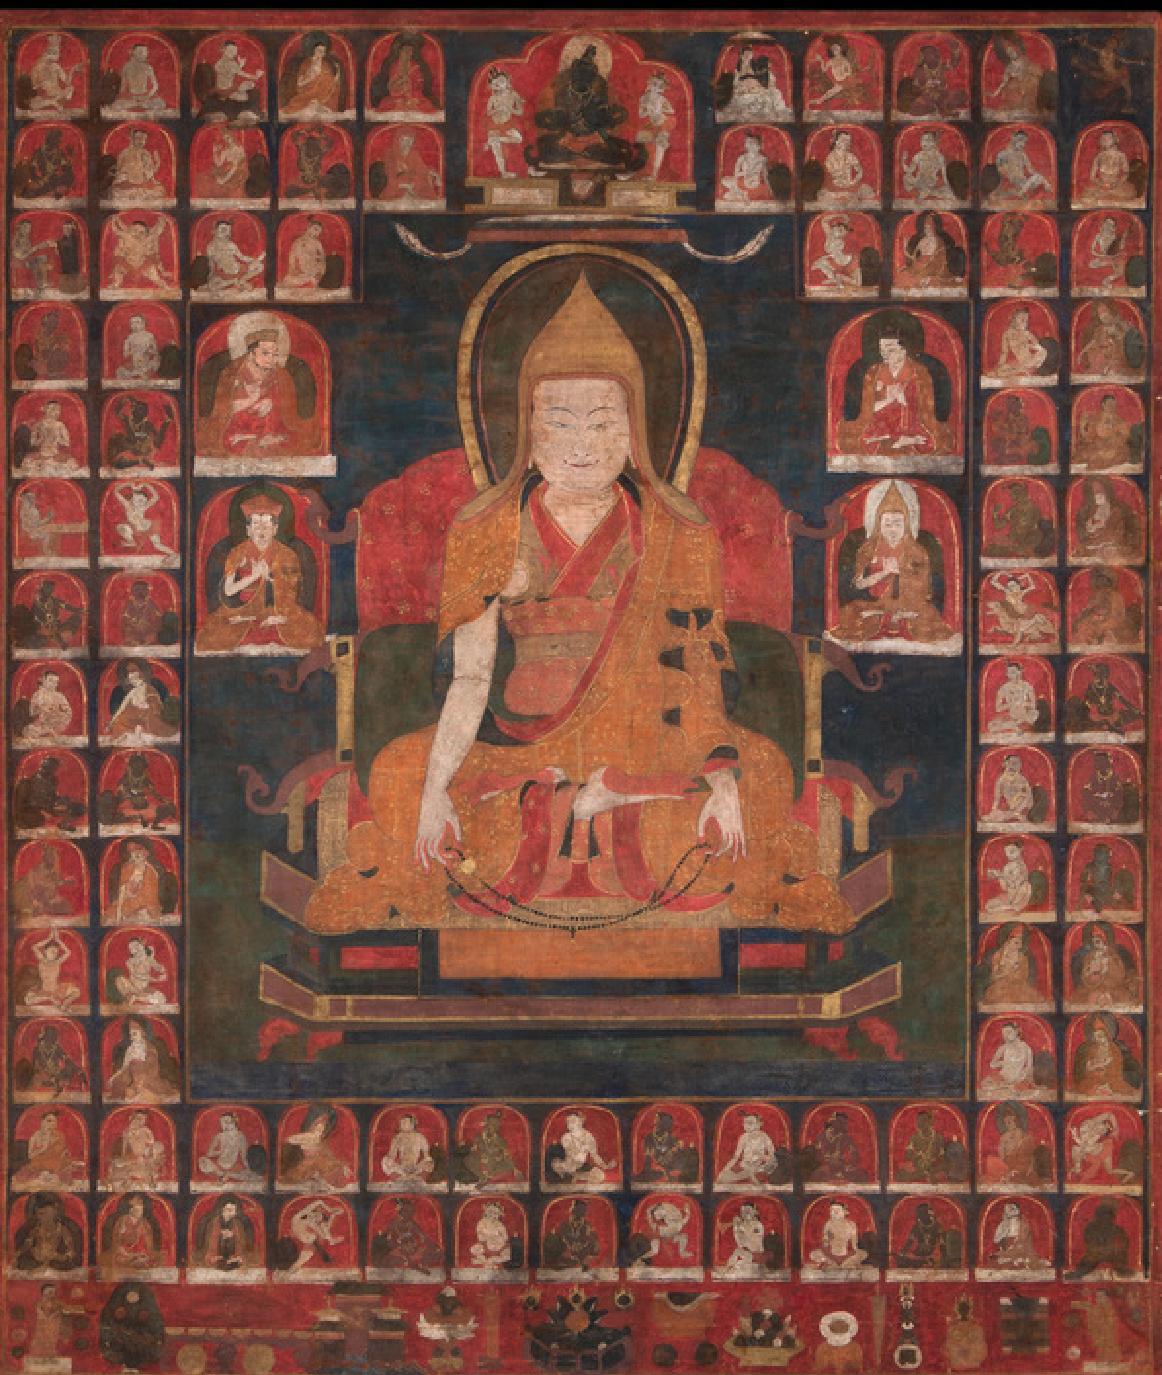 Tsongkhapa's Profound and Miraculous Wisdom - Ep. 177